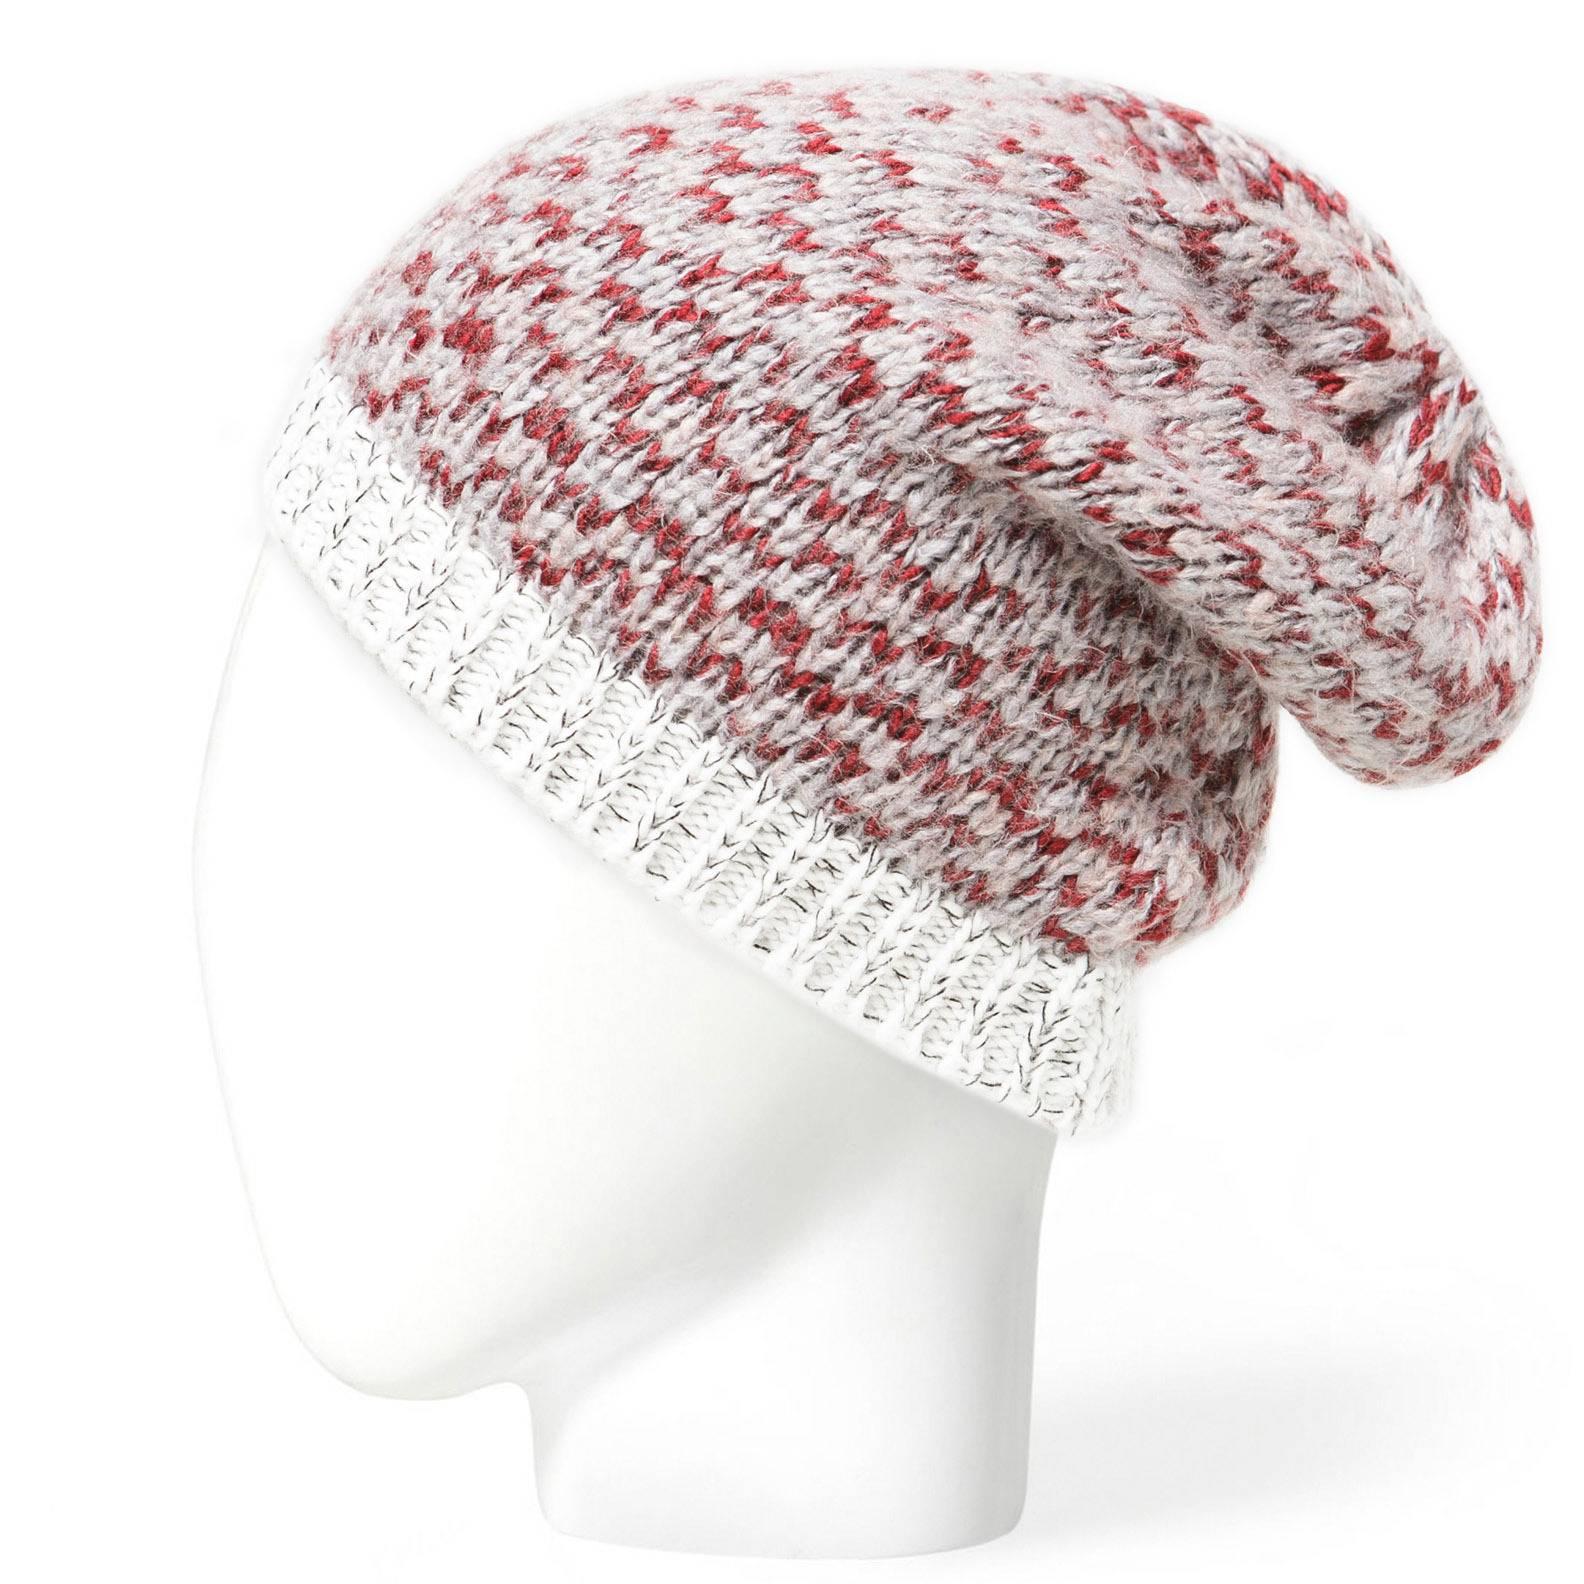 Mens custom knitted beanie hat